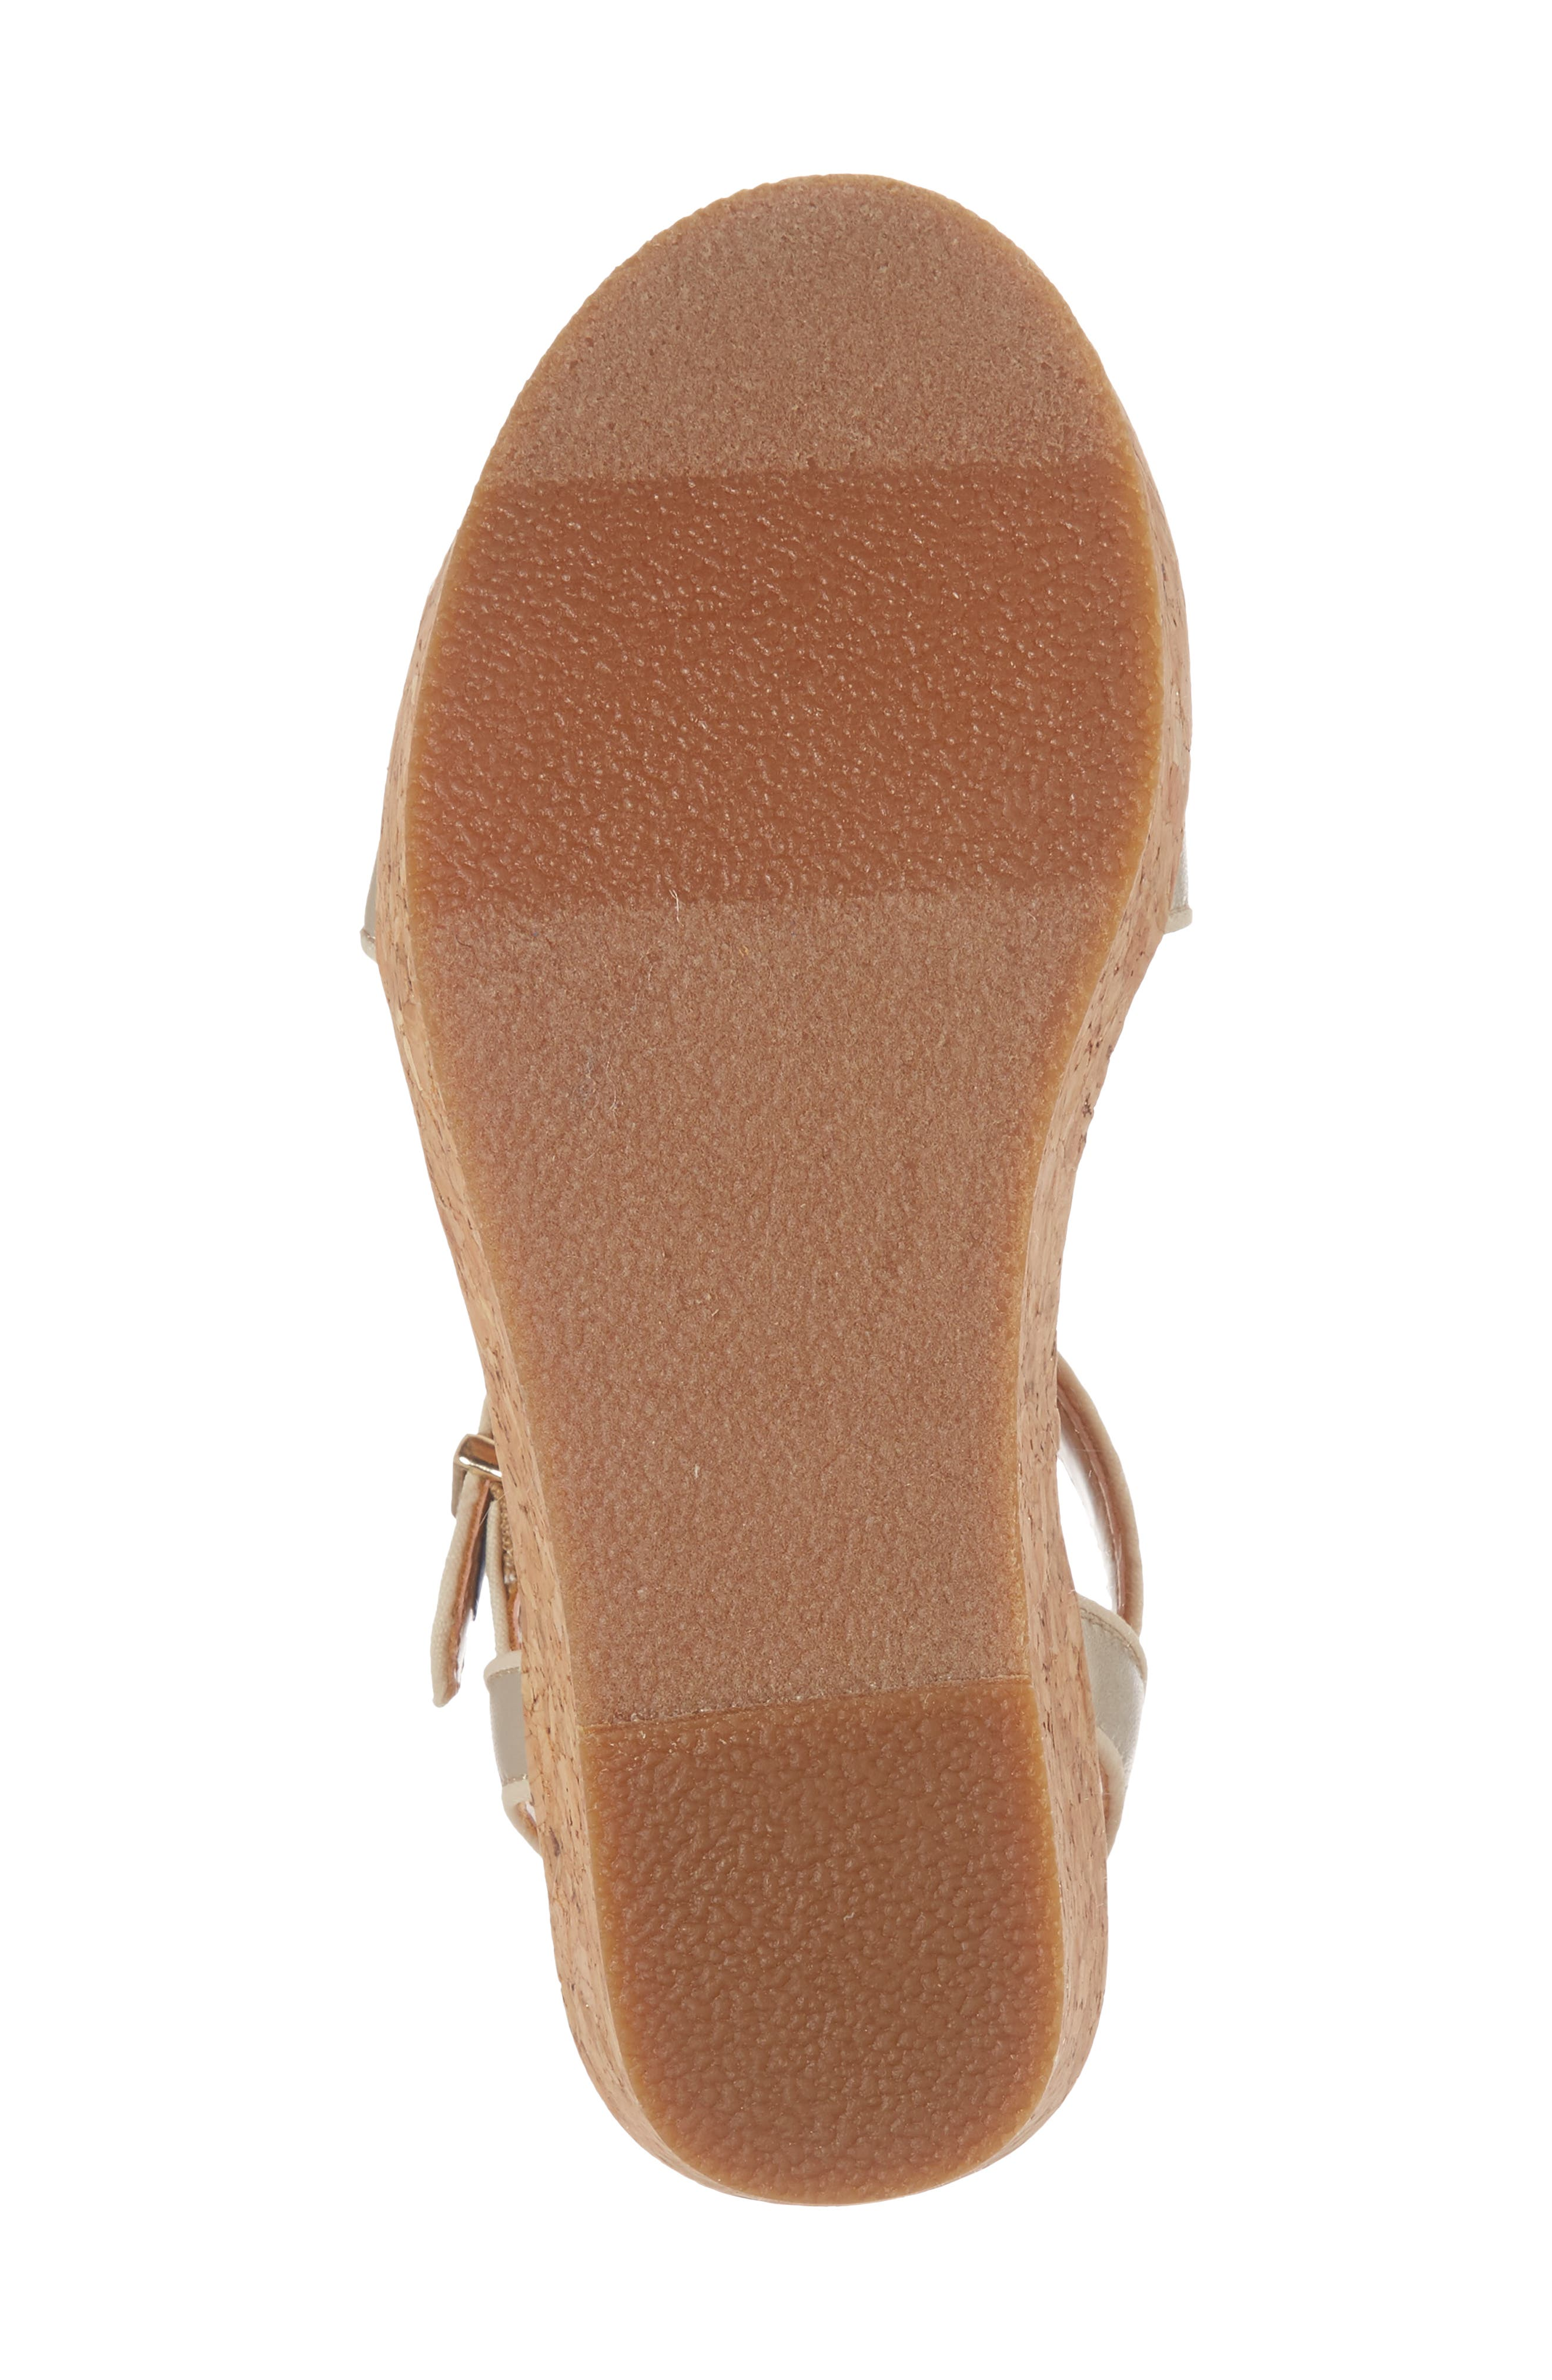 Milley Wedge Sandal,                             Alternate thumbnail 6, color,                             Gold